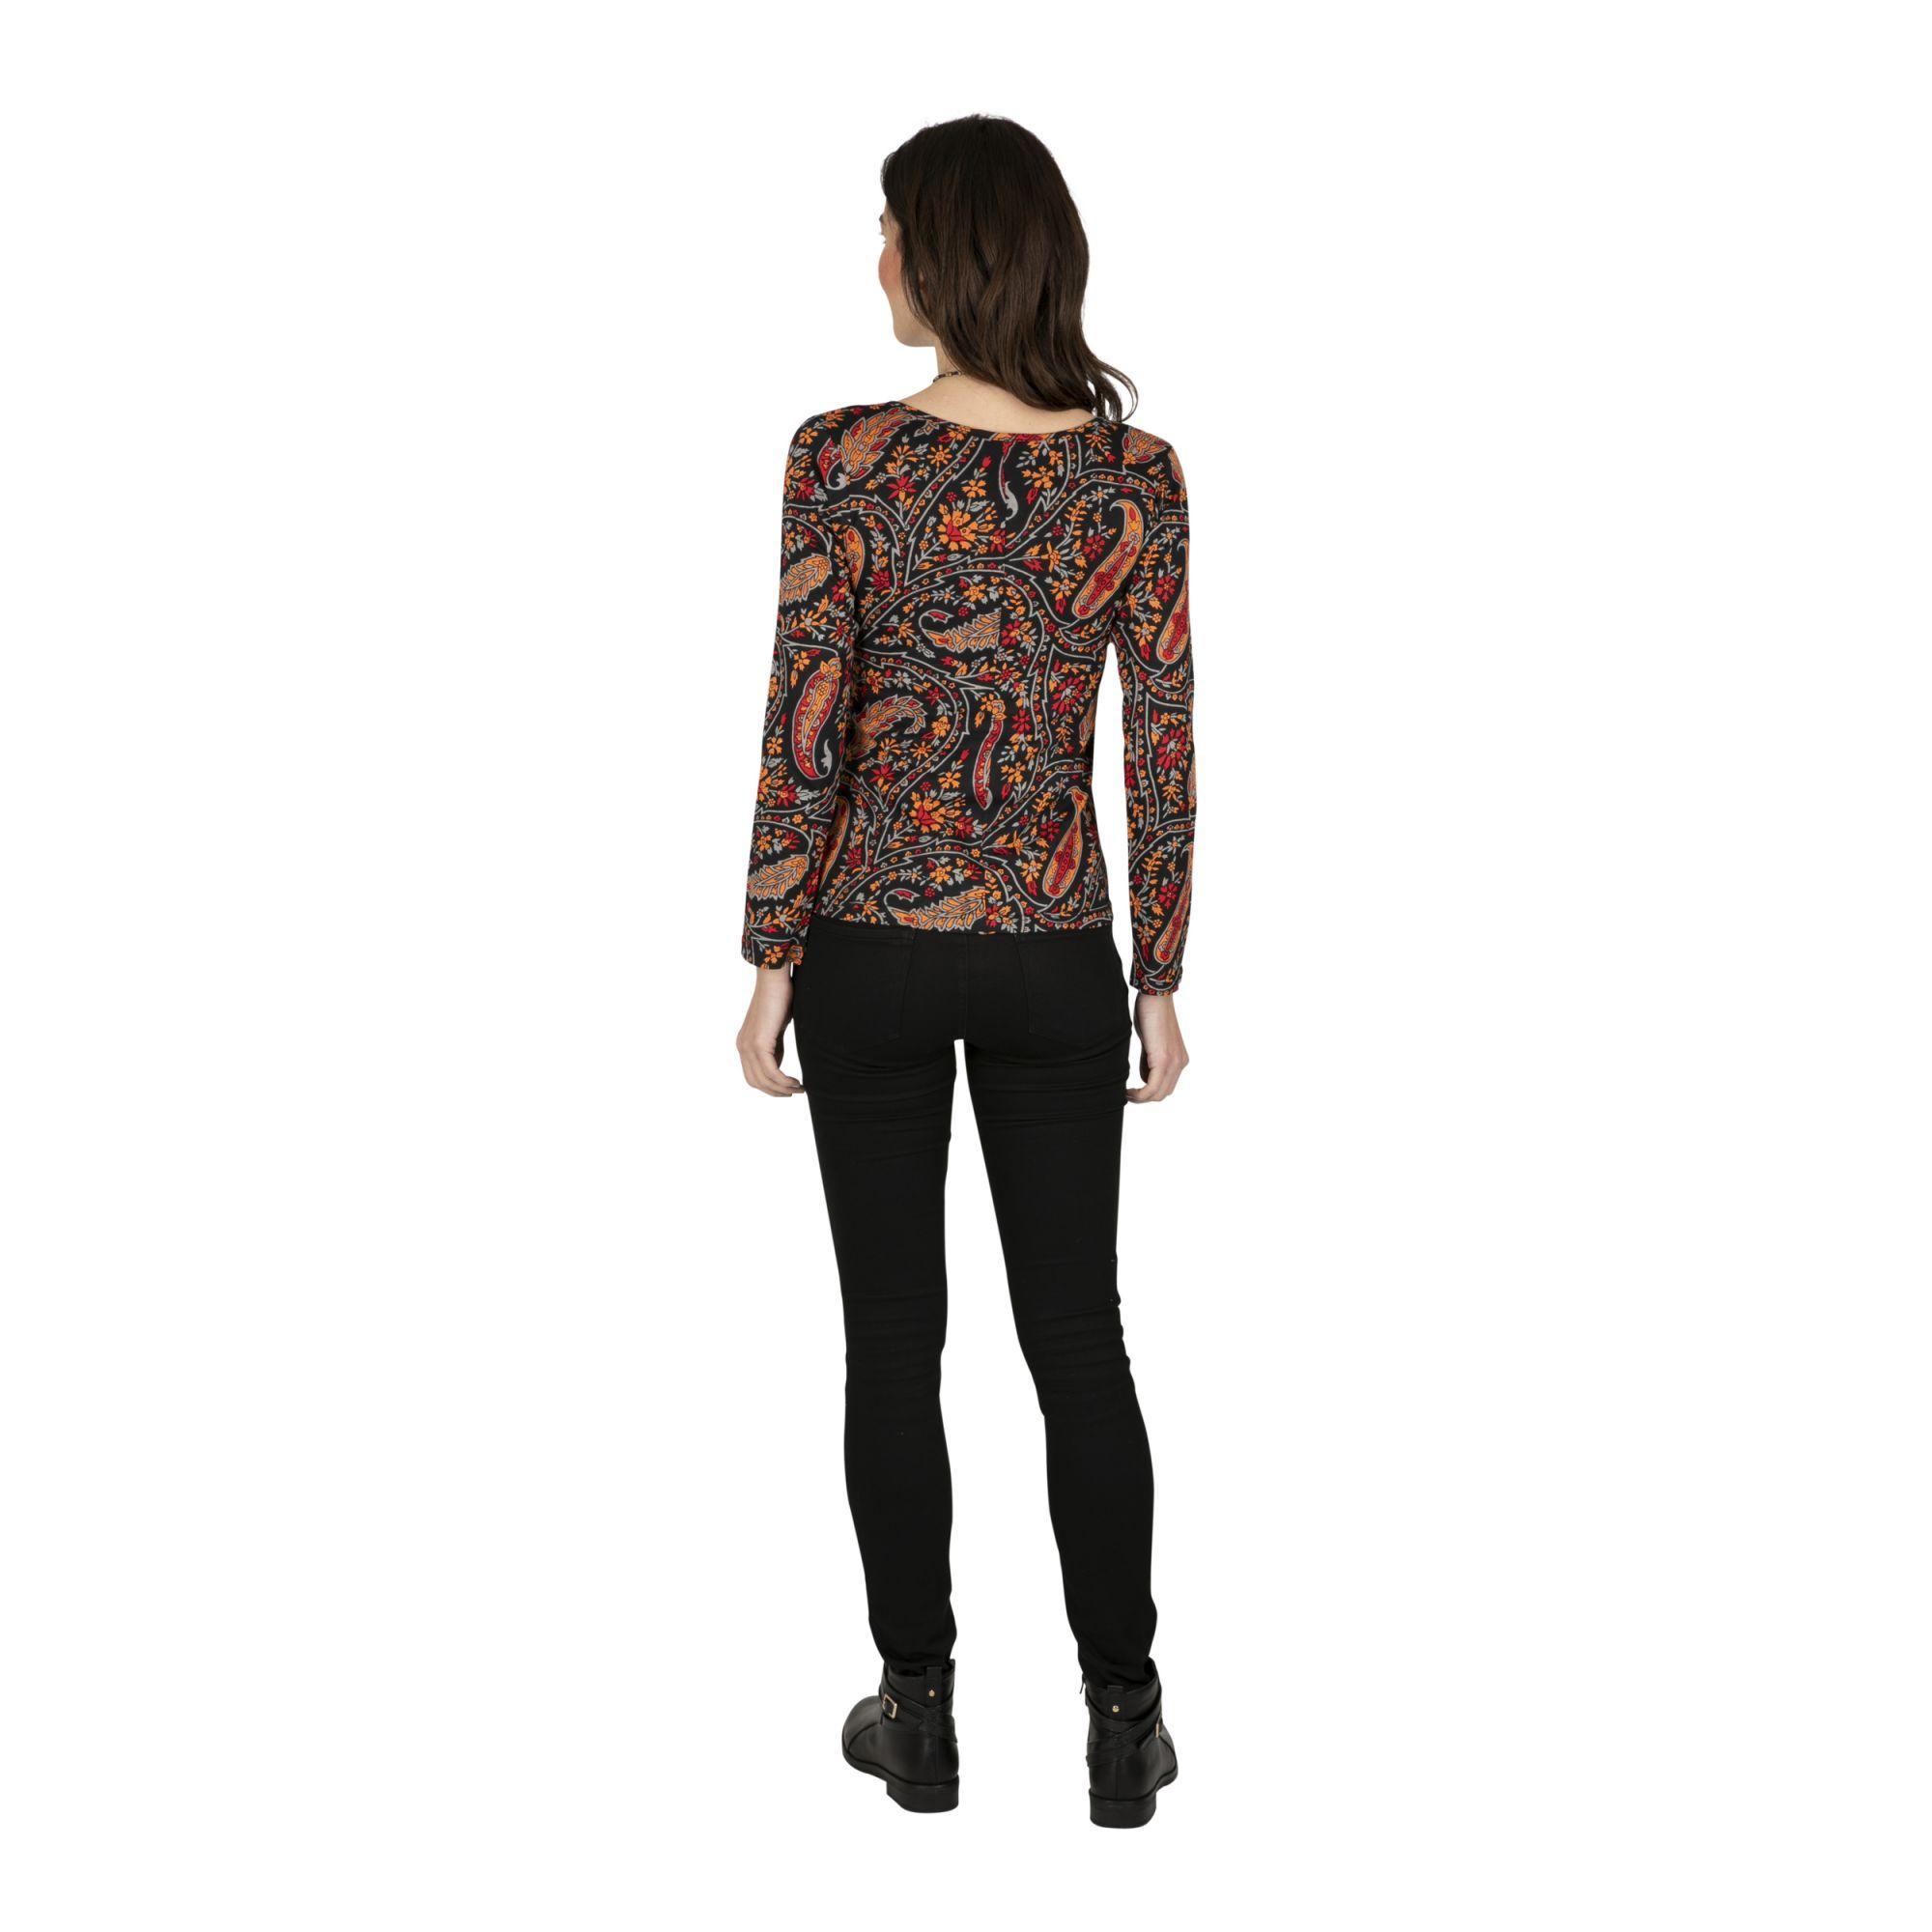 Tee-shirt femme hiver noir imprimé bohème Dakoro